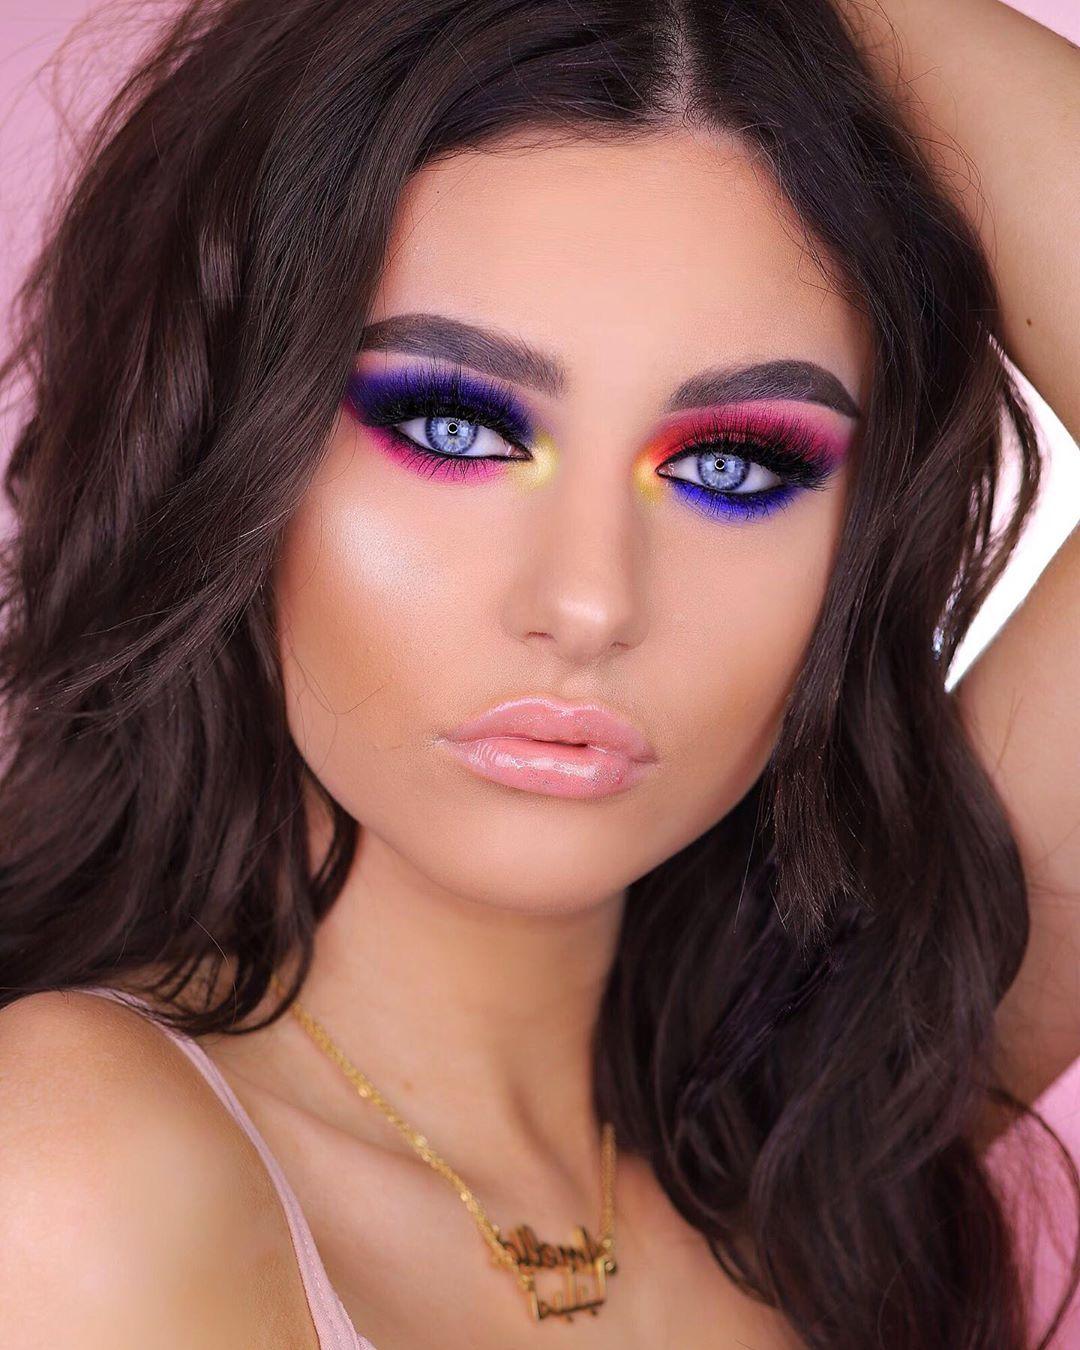 Maquiagem sombra neon colorida invertida